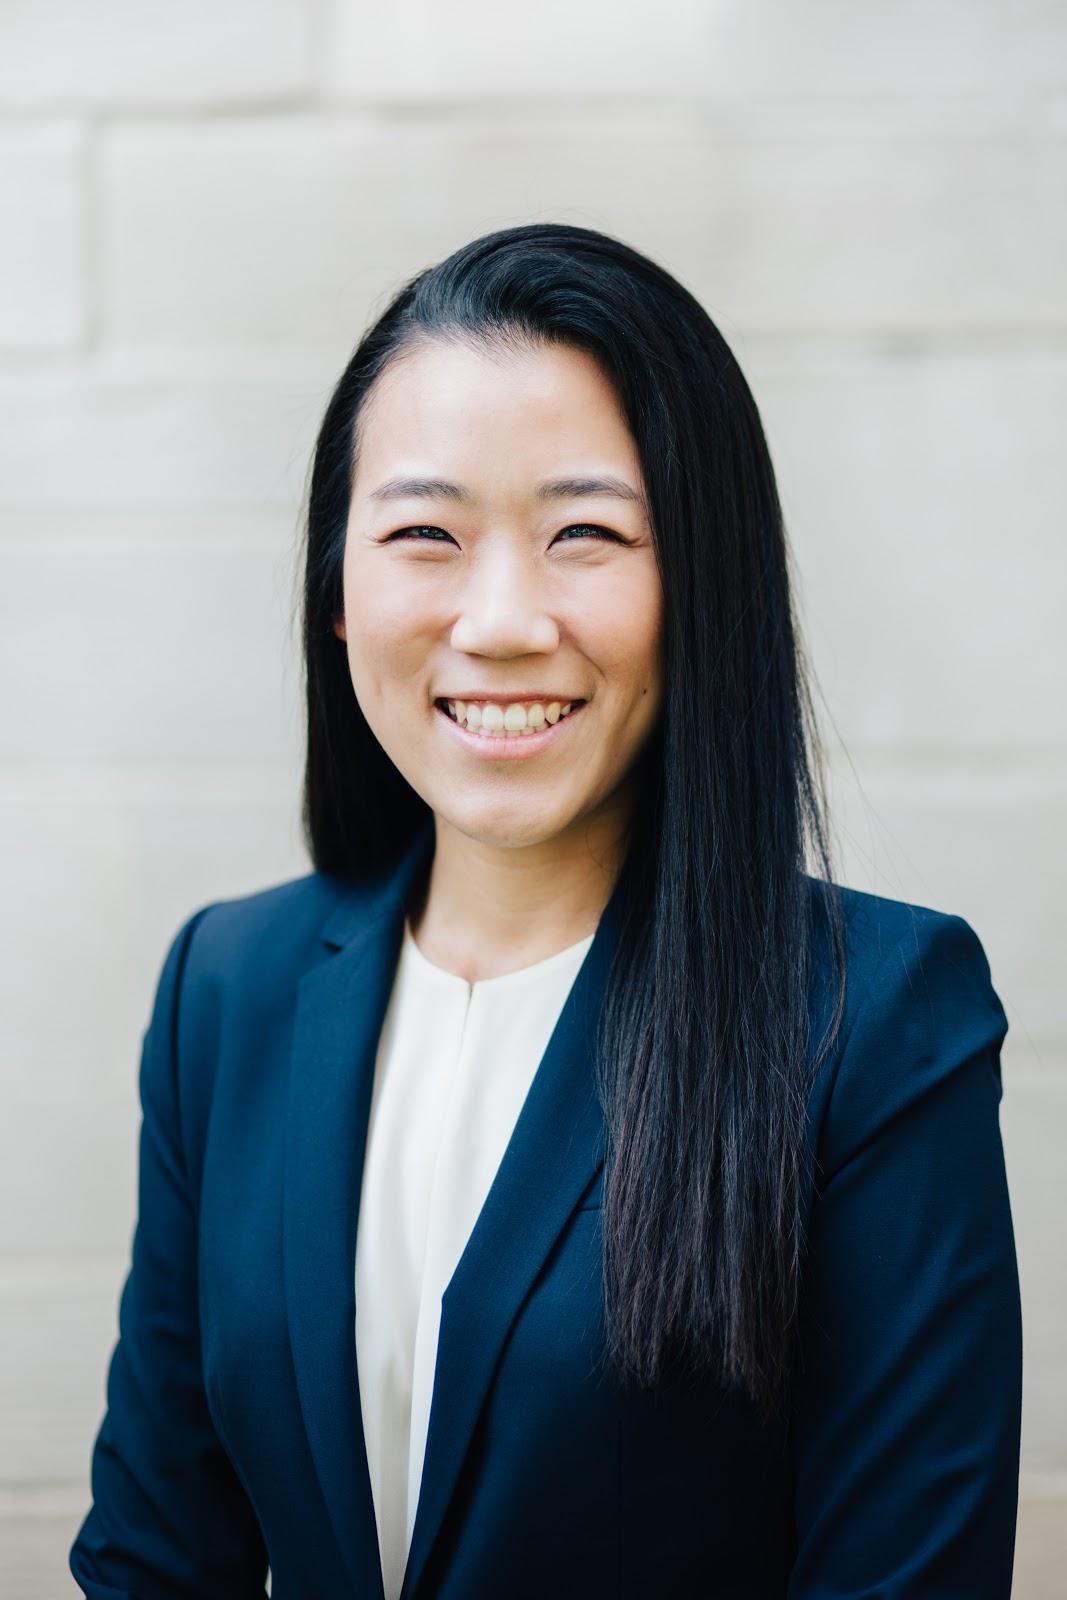 Dr. Jane Lee - Dr. Jane Lee specializes in pediatric emergency medicine in Detroit.